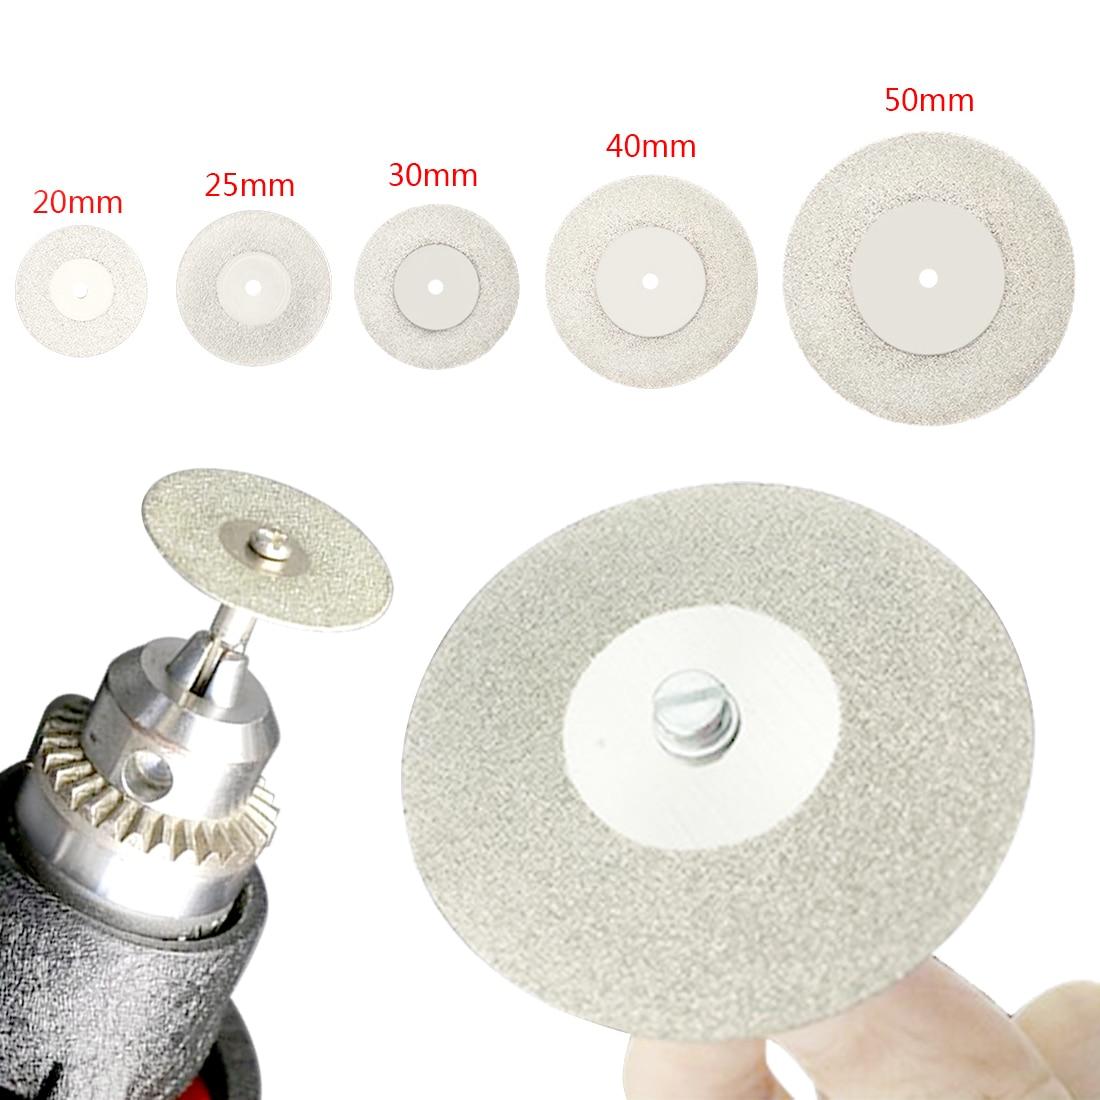 20-50mm Diamond Cutting Discs & Drill Bit  Mini Circular Saw For Rotary Tool Dremel Stone Blade